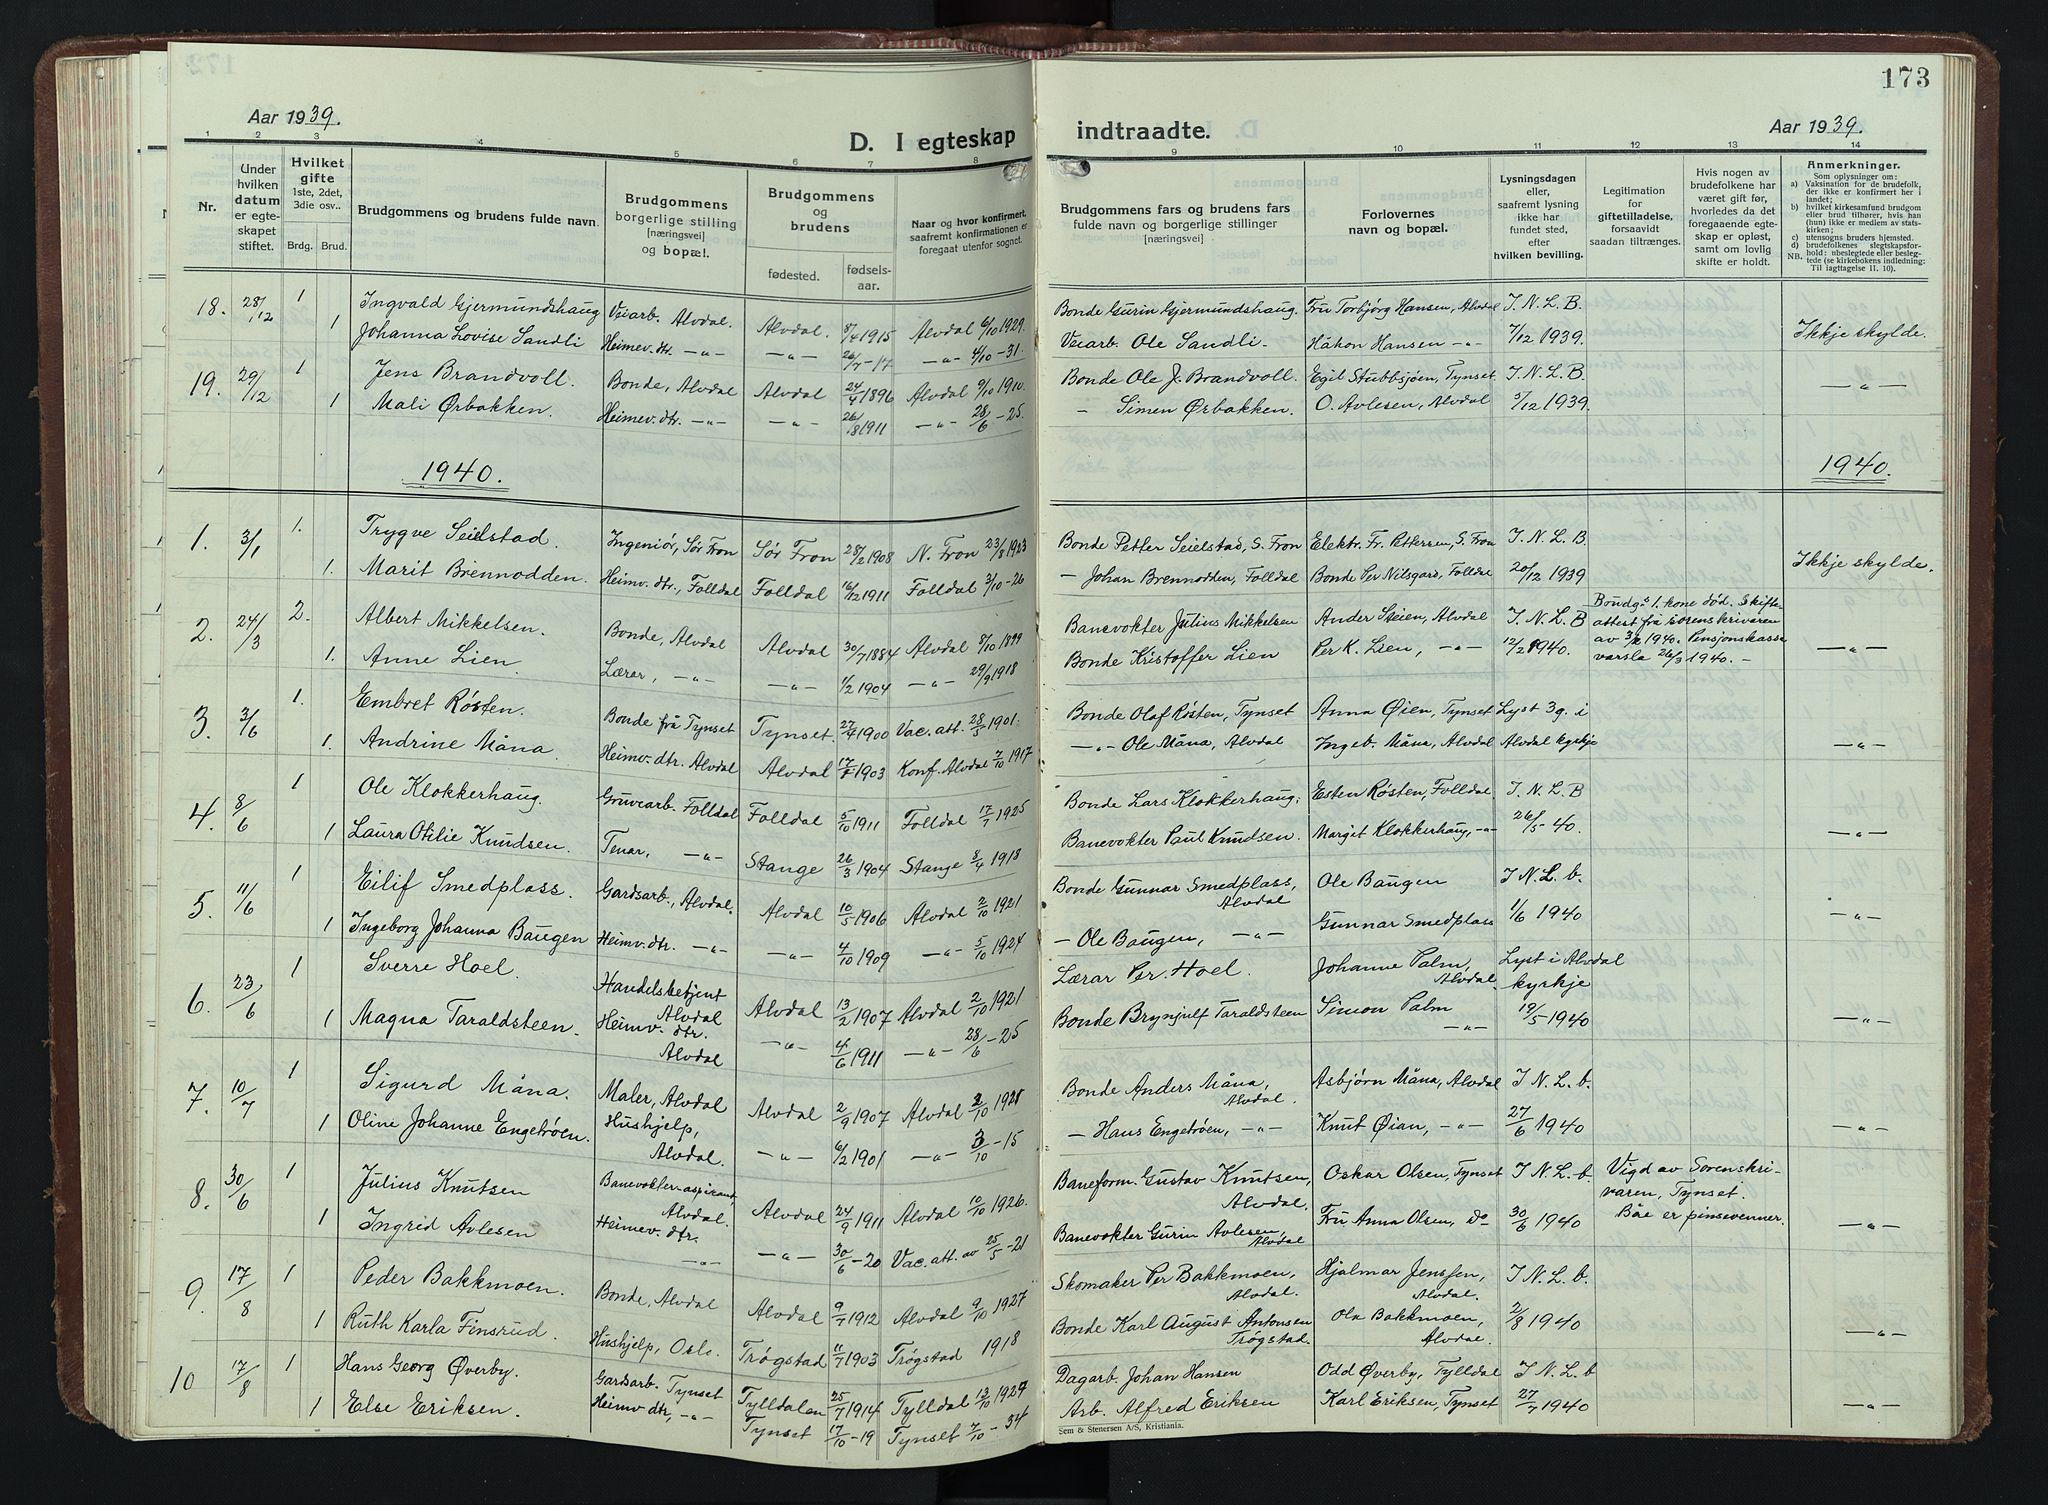 SAH, Alvdal prestekontor, Klokkerbok nr. 7, 1924-1945, s. 173